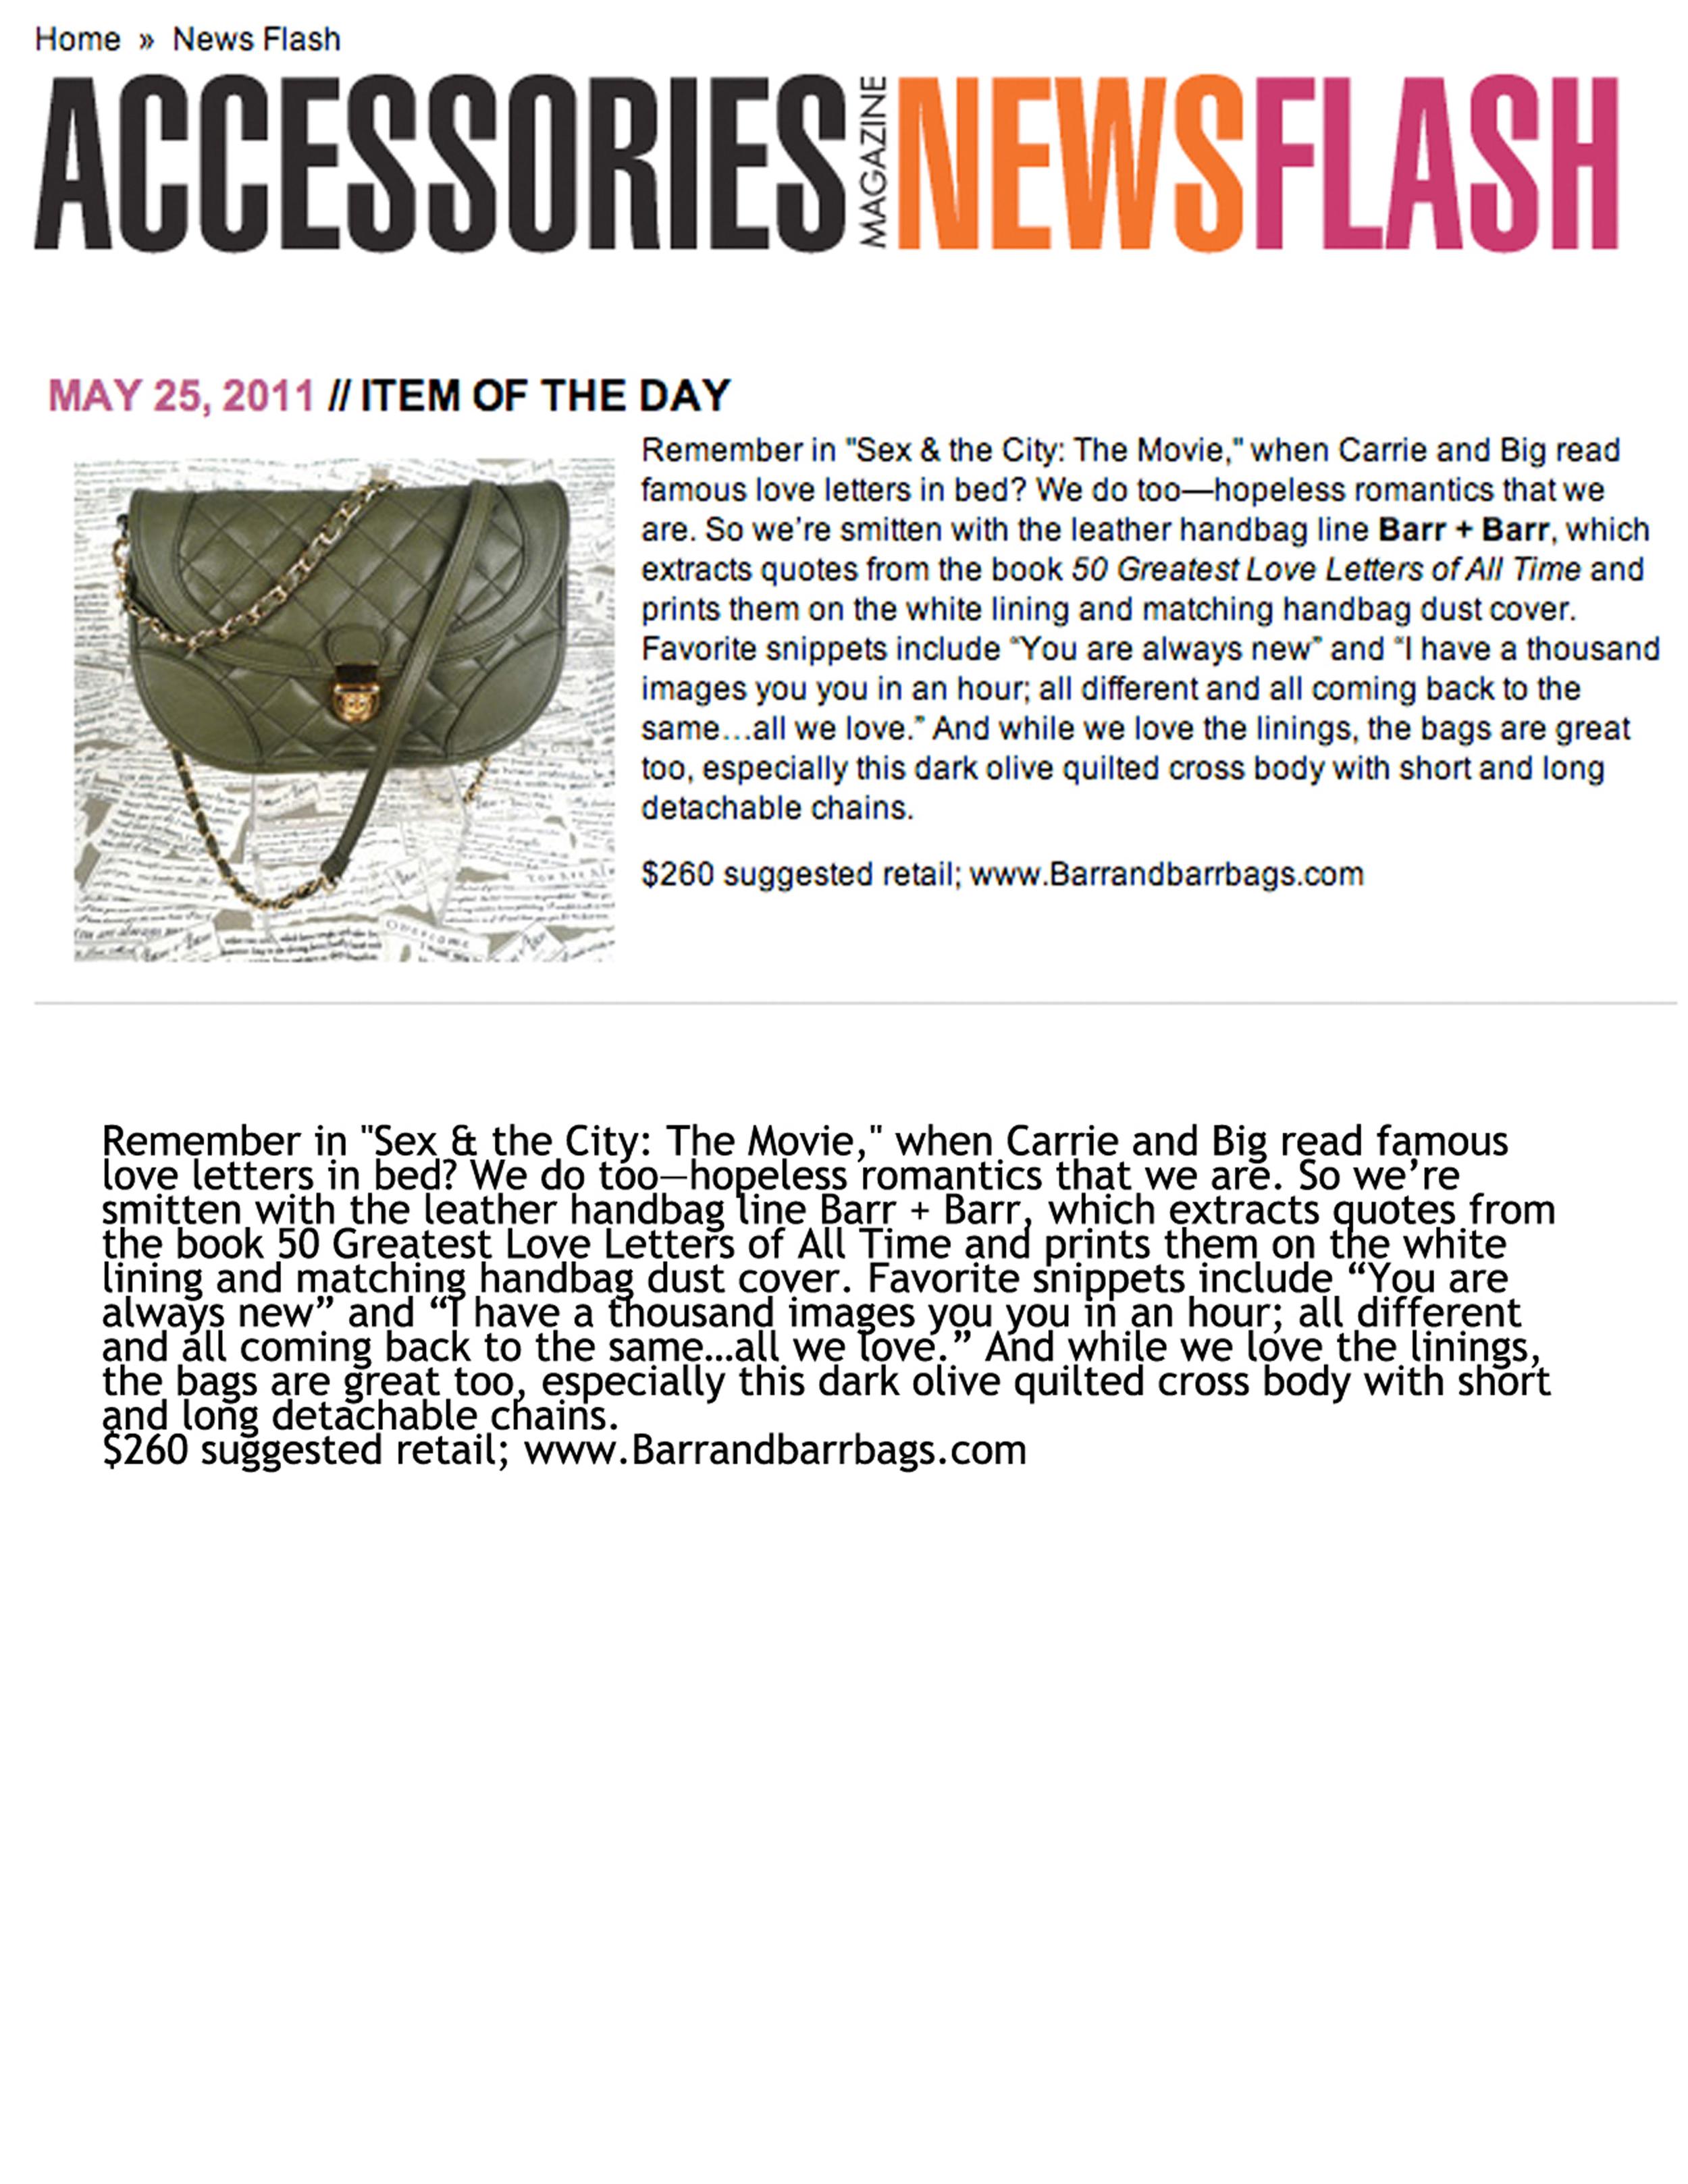 barr + barr luxury handbags and footwear designed by Helen Barr, as seen in Accessories Newsflash